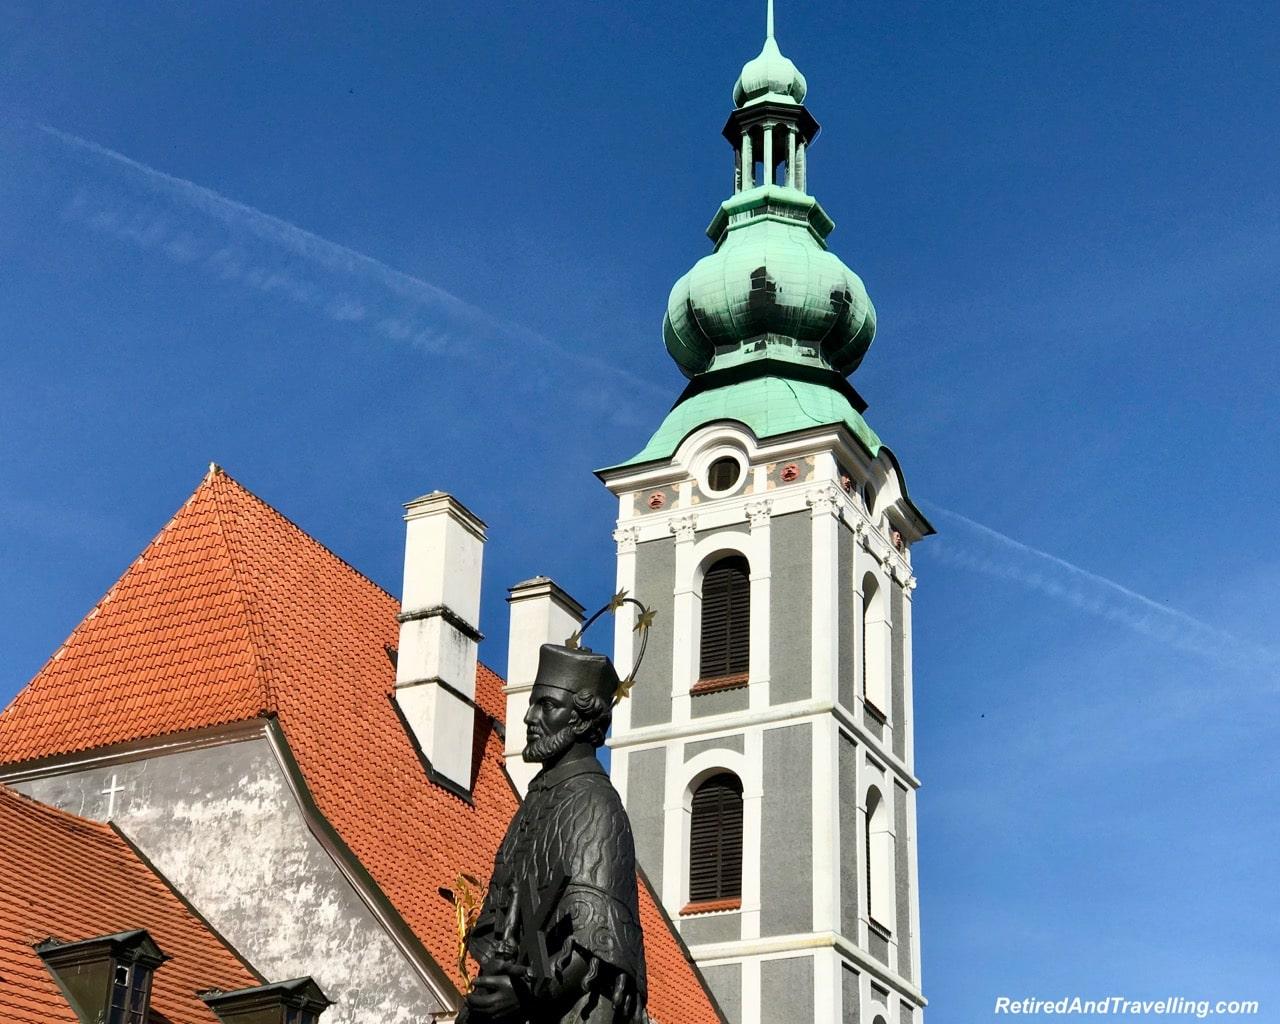 St Jost Church Cesky Krumlov - Churches And Castles In The Czech Republic.jpg